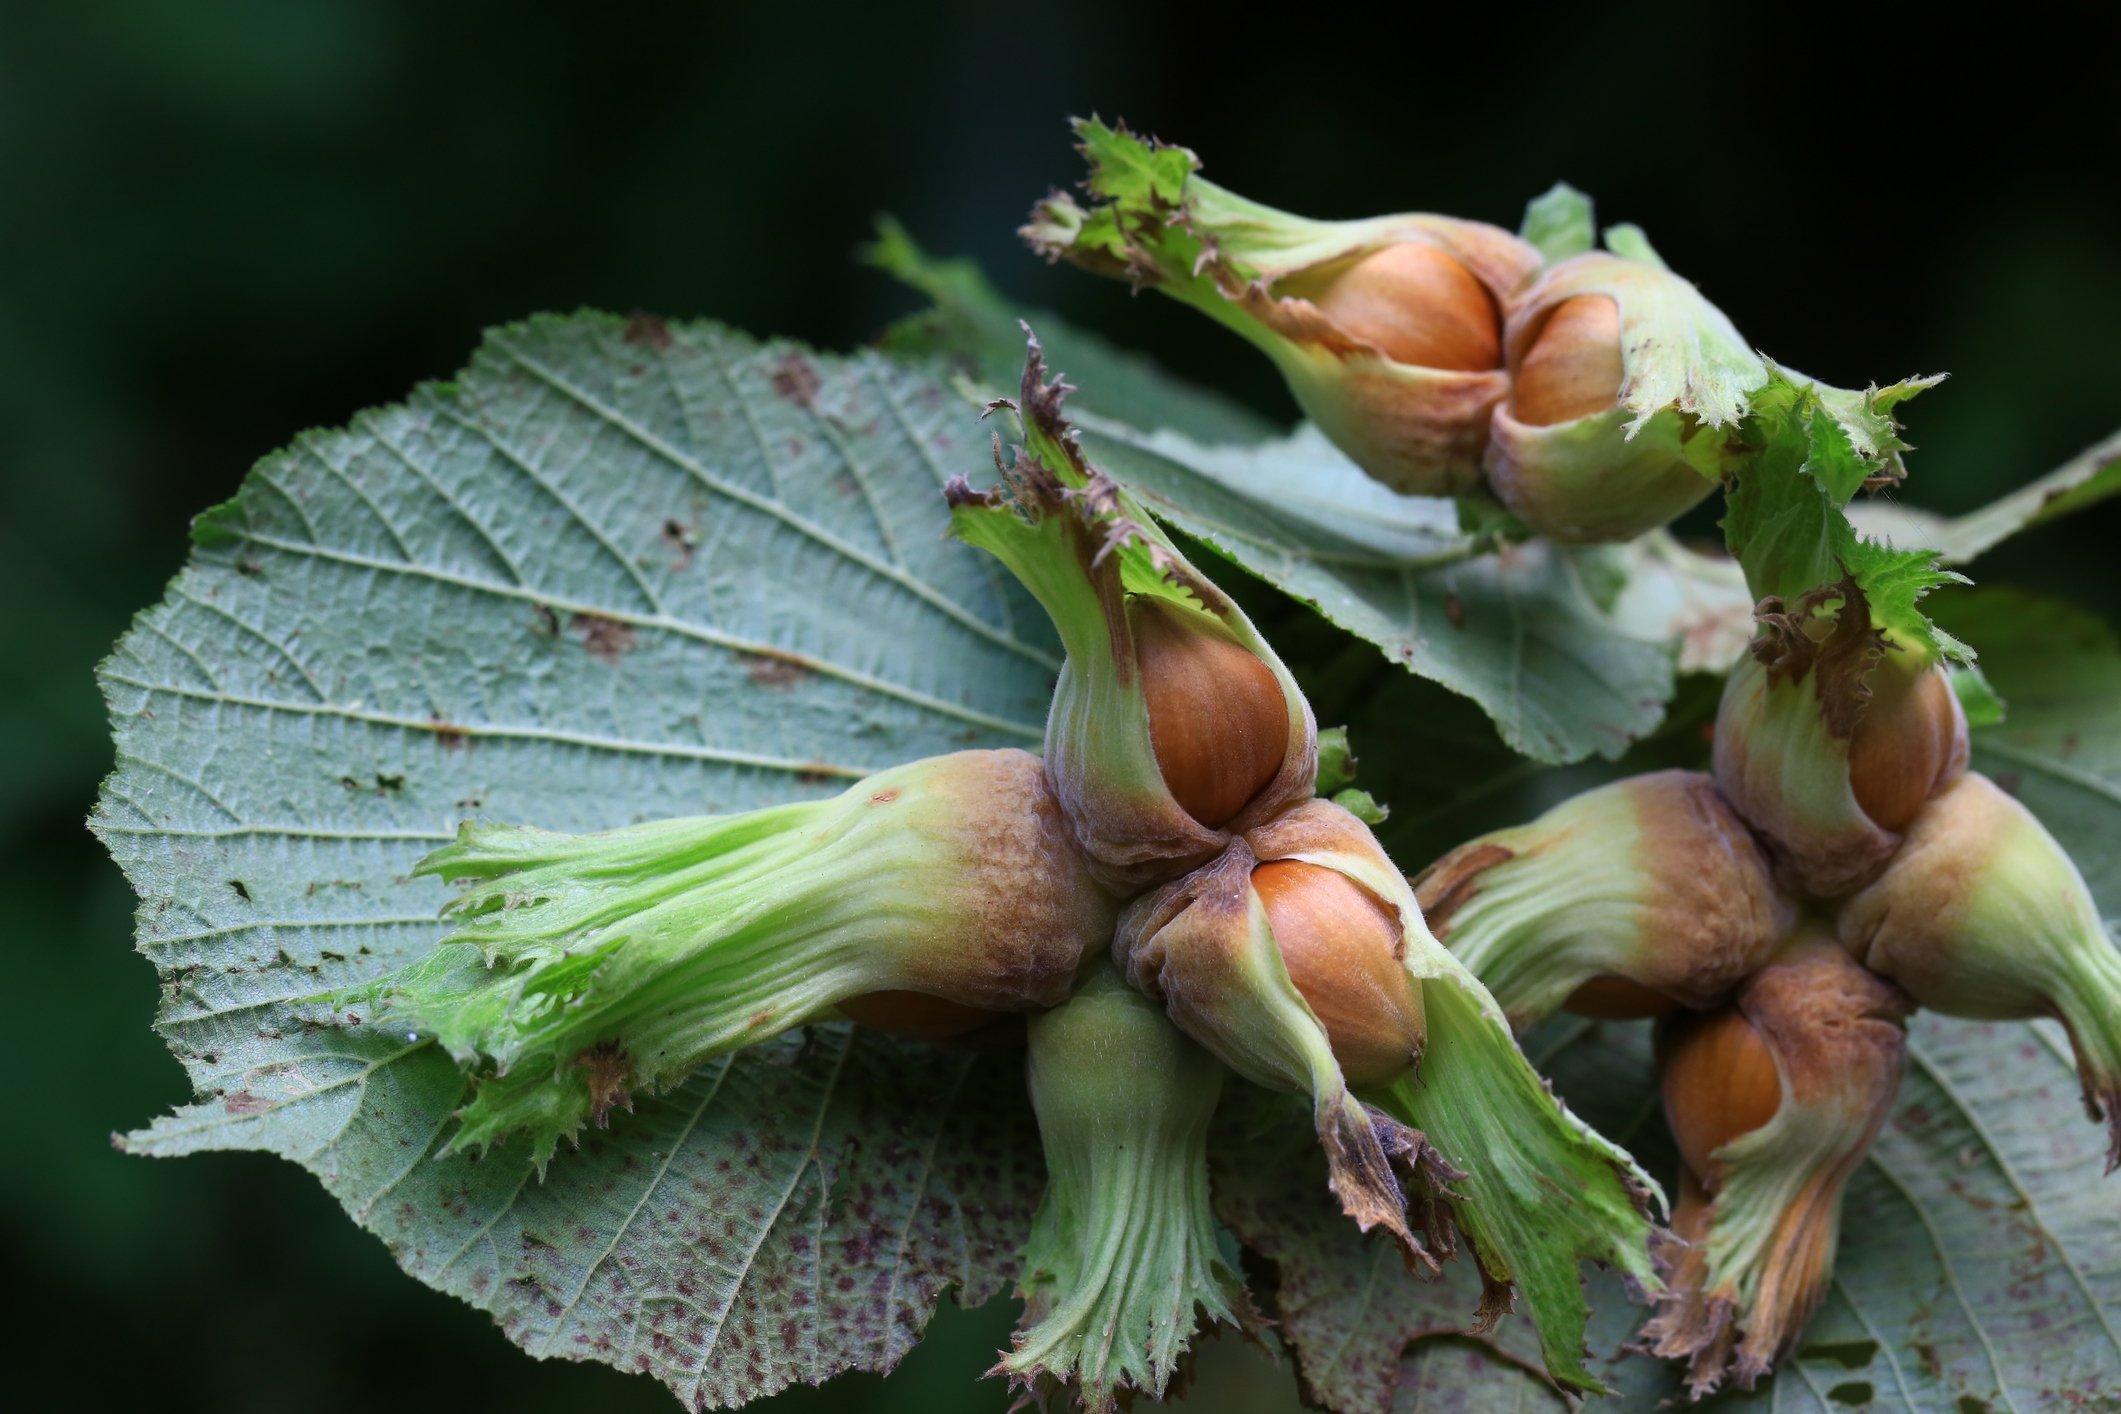 榛子树的果实。 (iStock Photo)